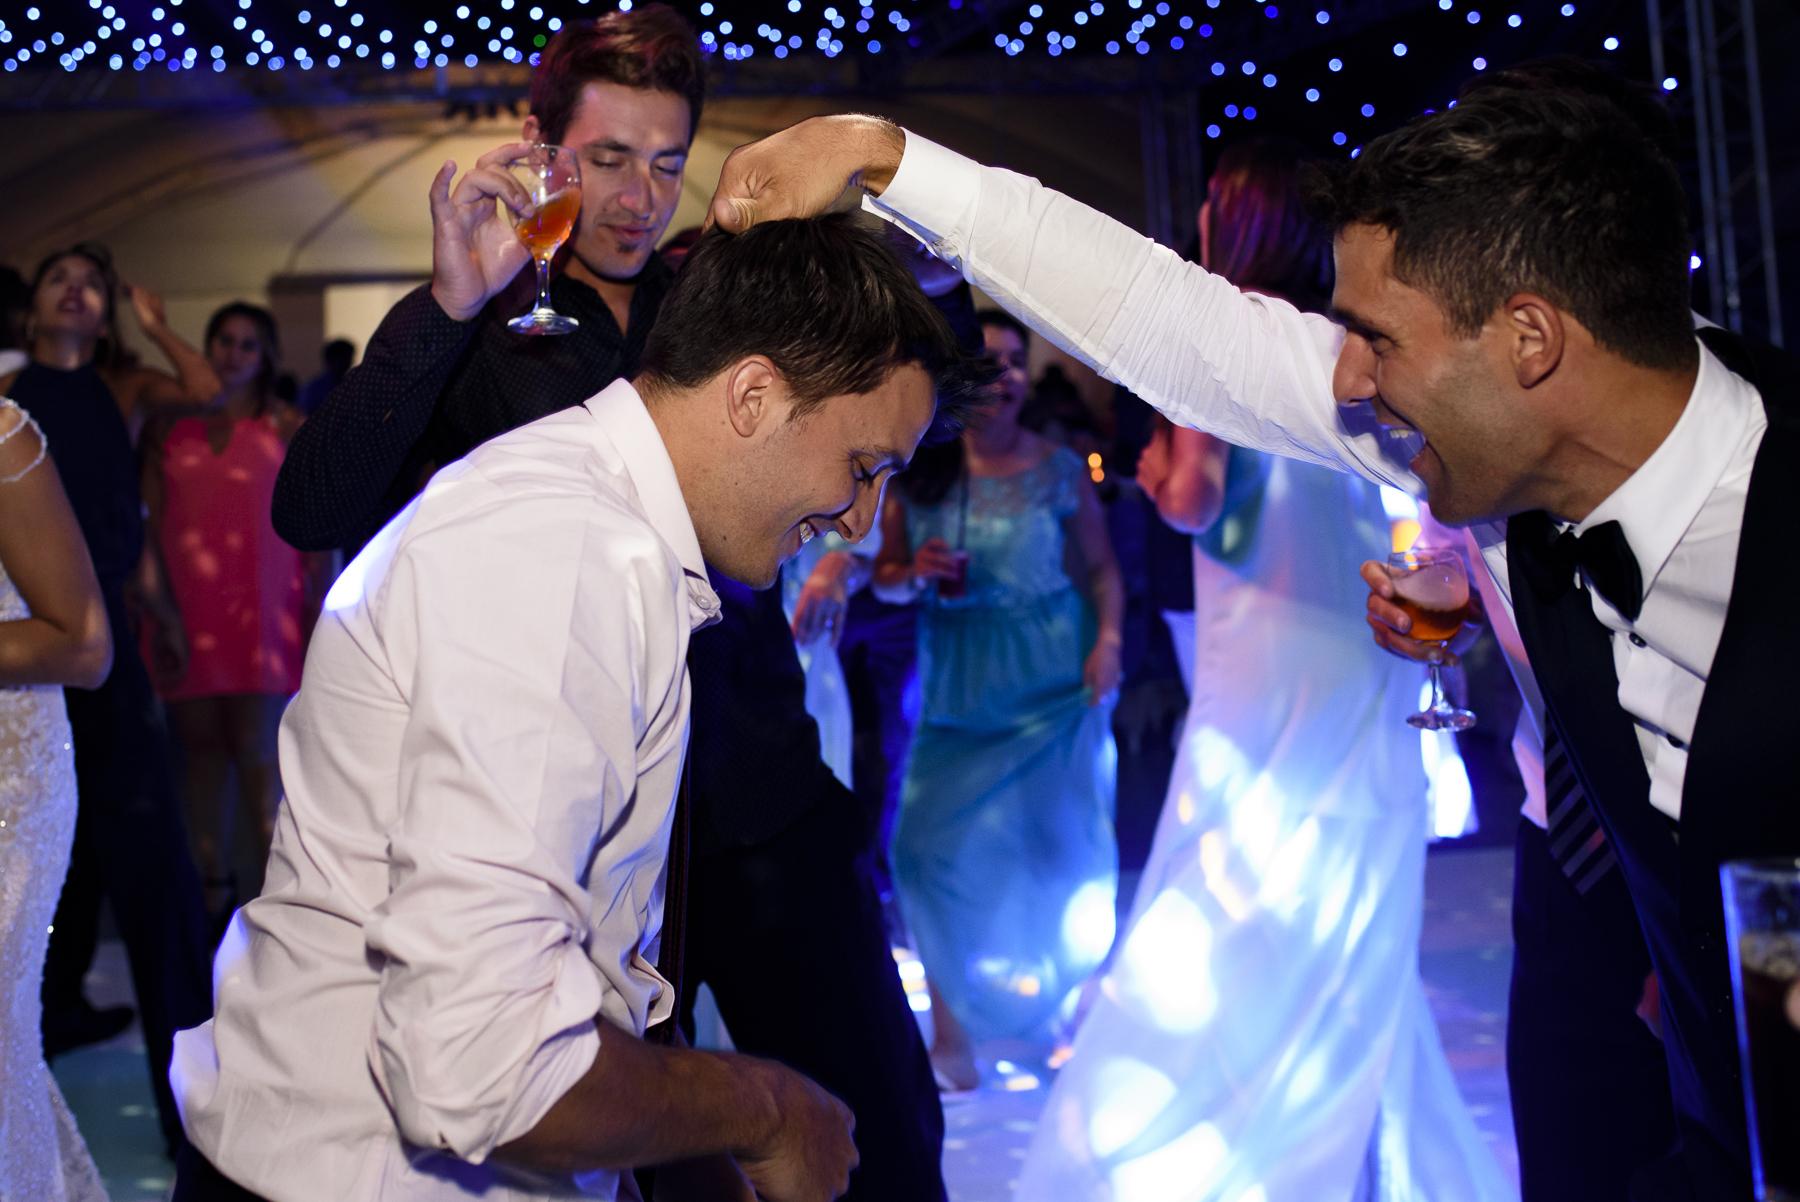 Mariana y Marco - boda - casamiento - emilia gualdoni fotografia